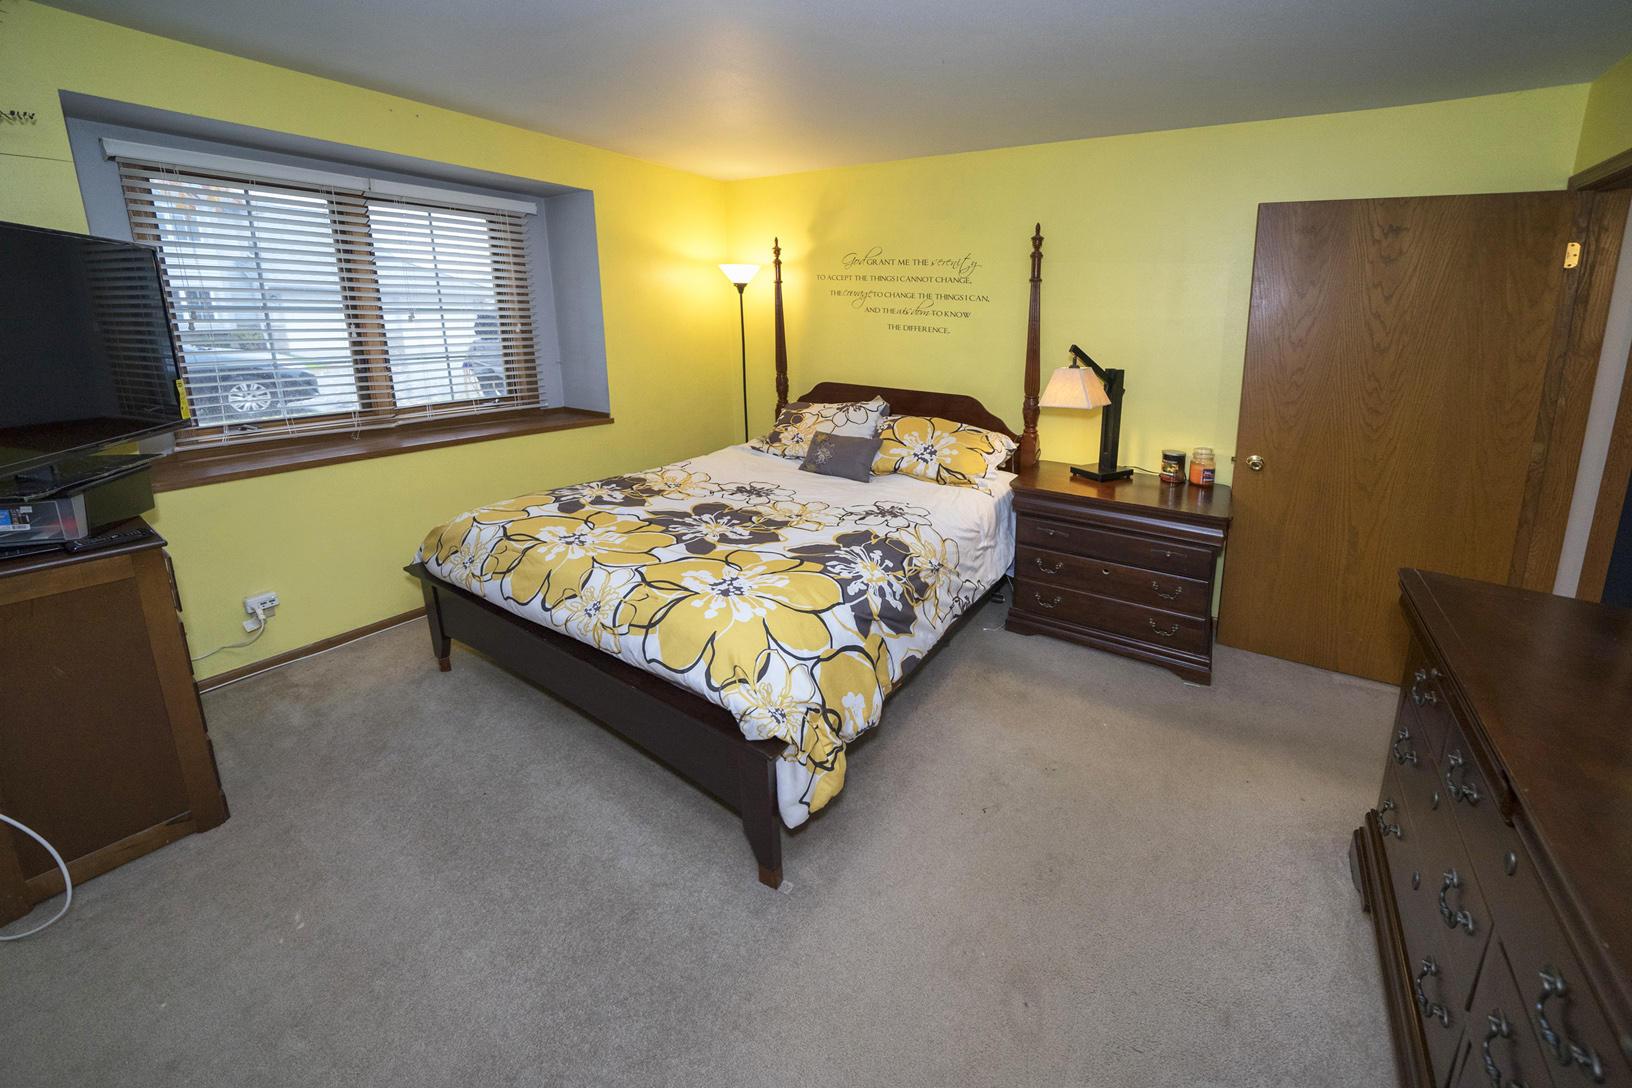 949 Quinlan Dr, Pewaukee, Wisconsin 53072, 2 Bedrooms Bedrooms, 5 Rooms Rooms,2 BathroomsBathrooms,Condominiums,For Sale,Quinlan Dr,1,1665092